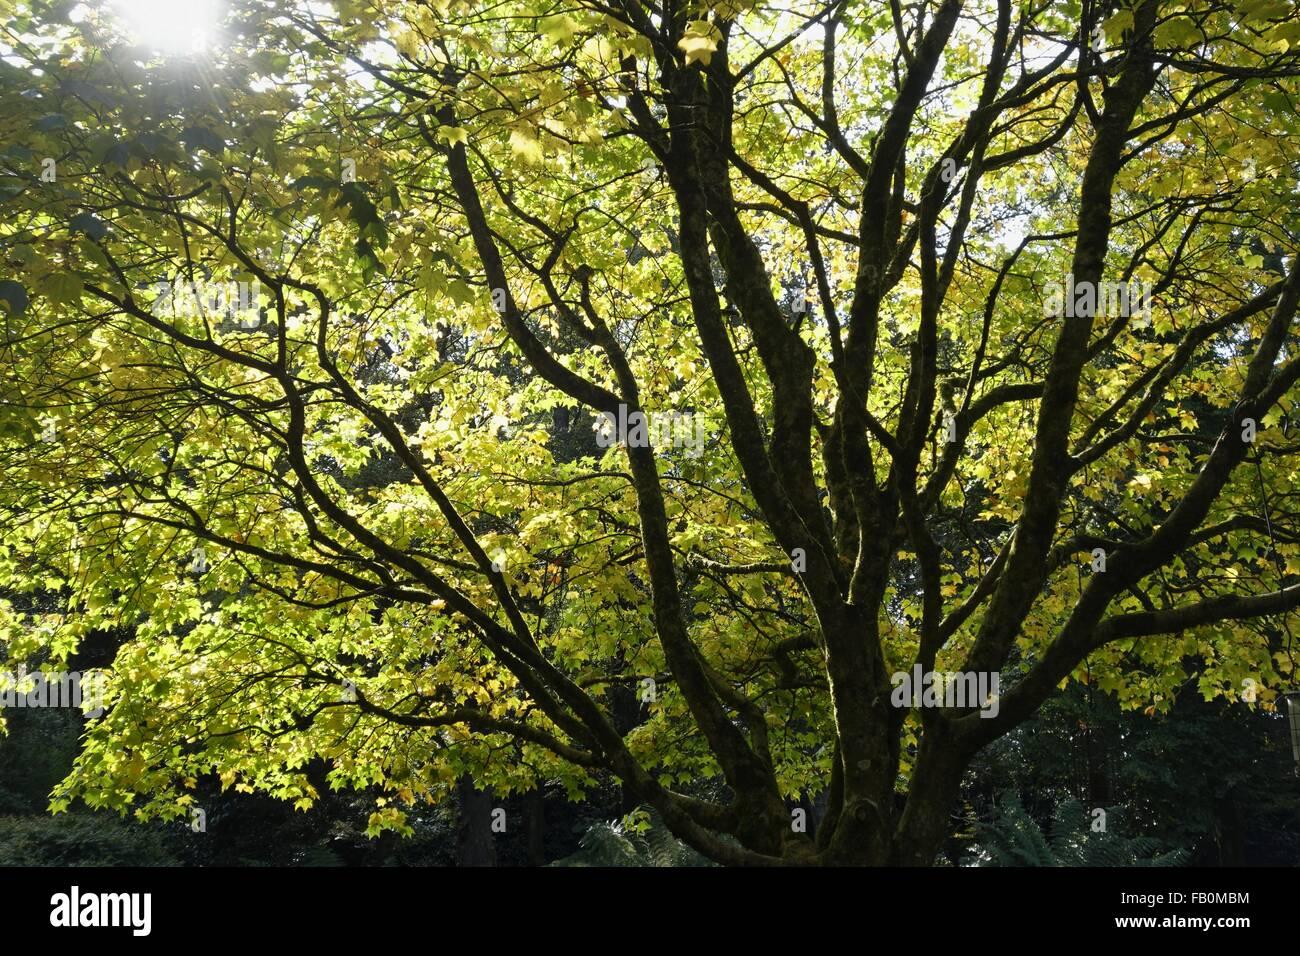 Sonne fällt durch Baumkronen, Cornwall, UK. Stockbild